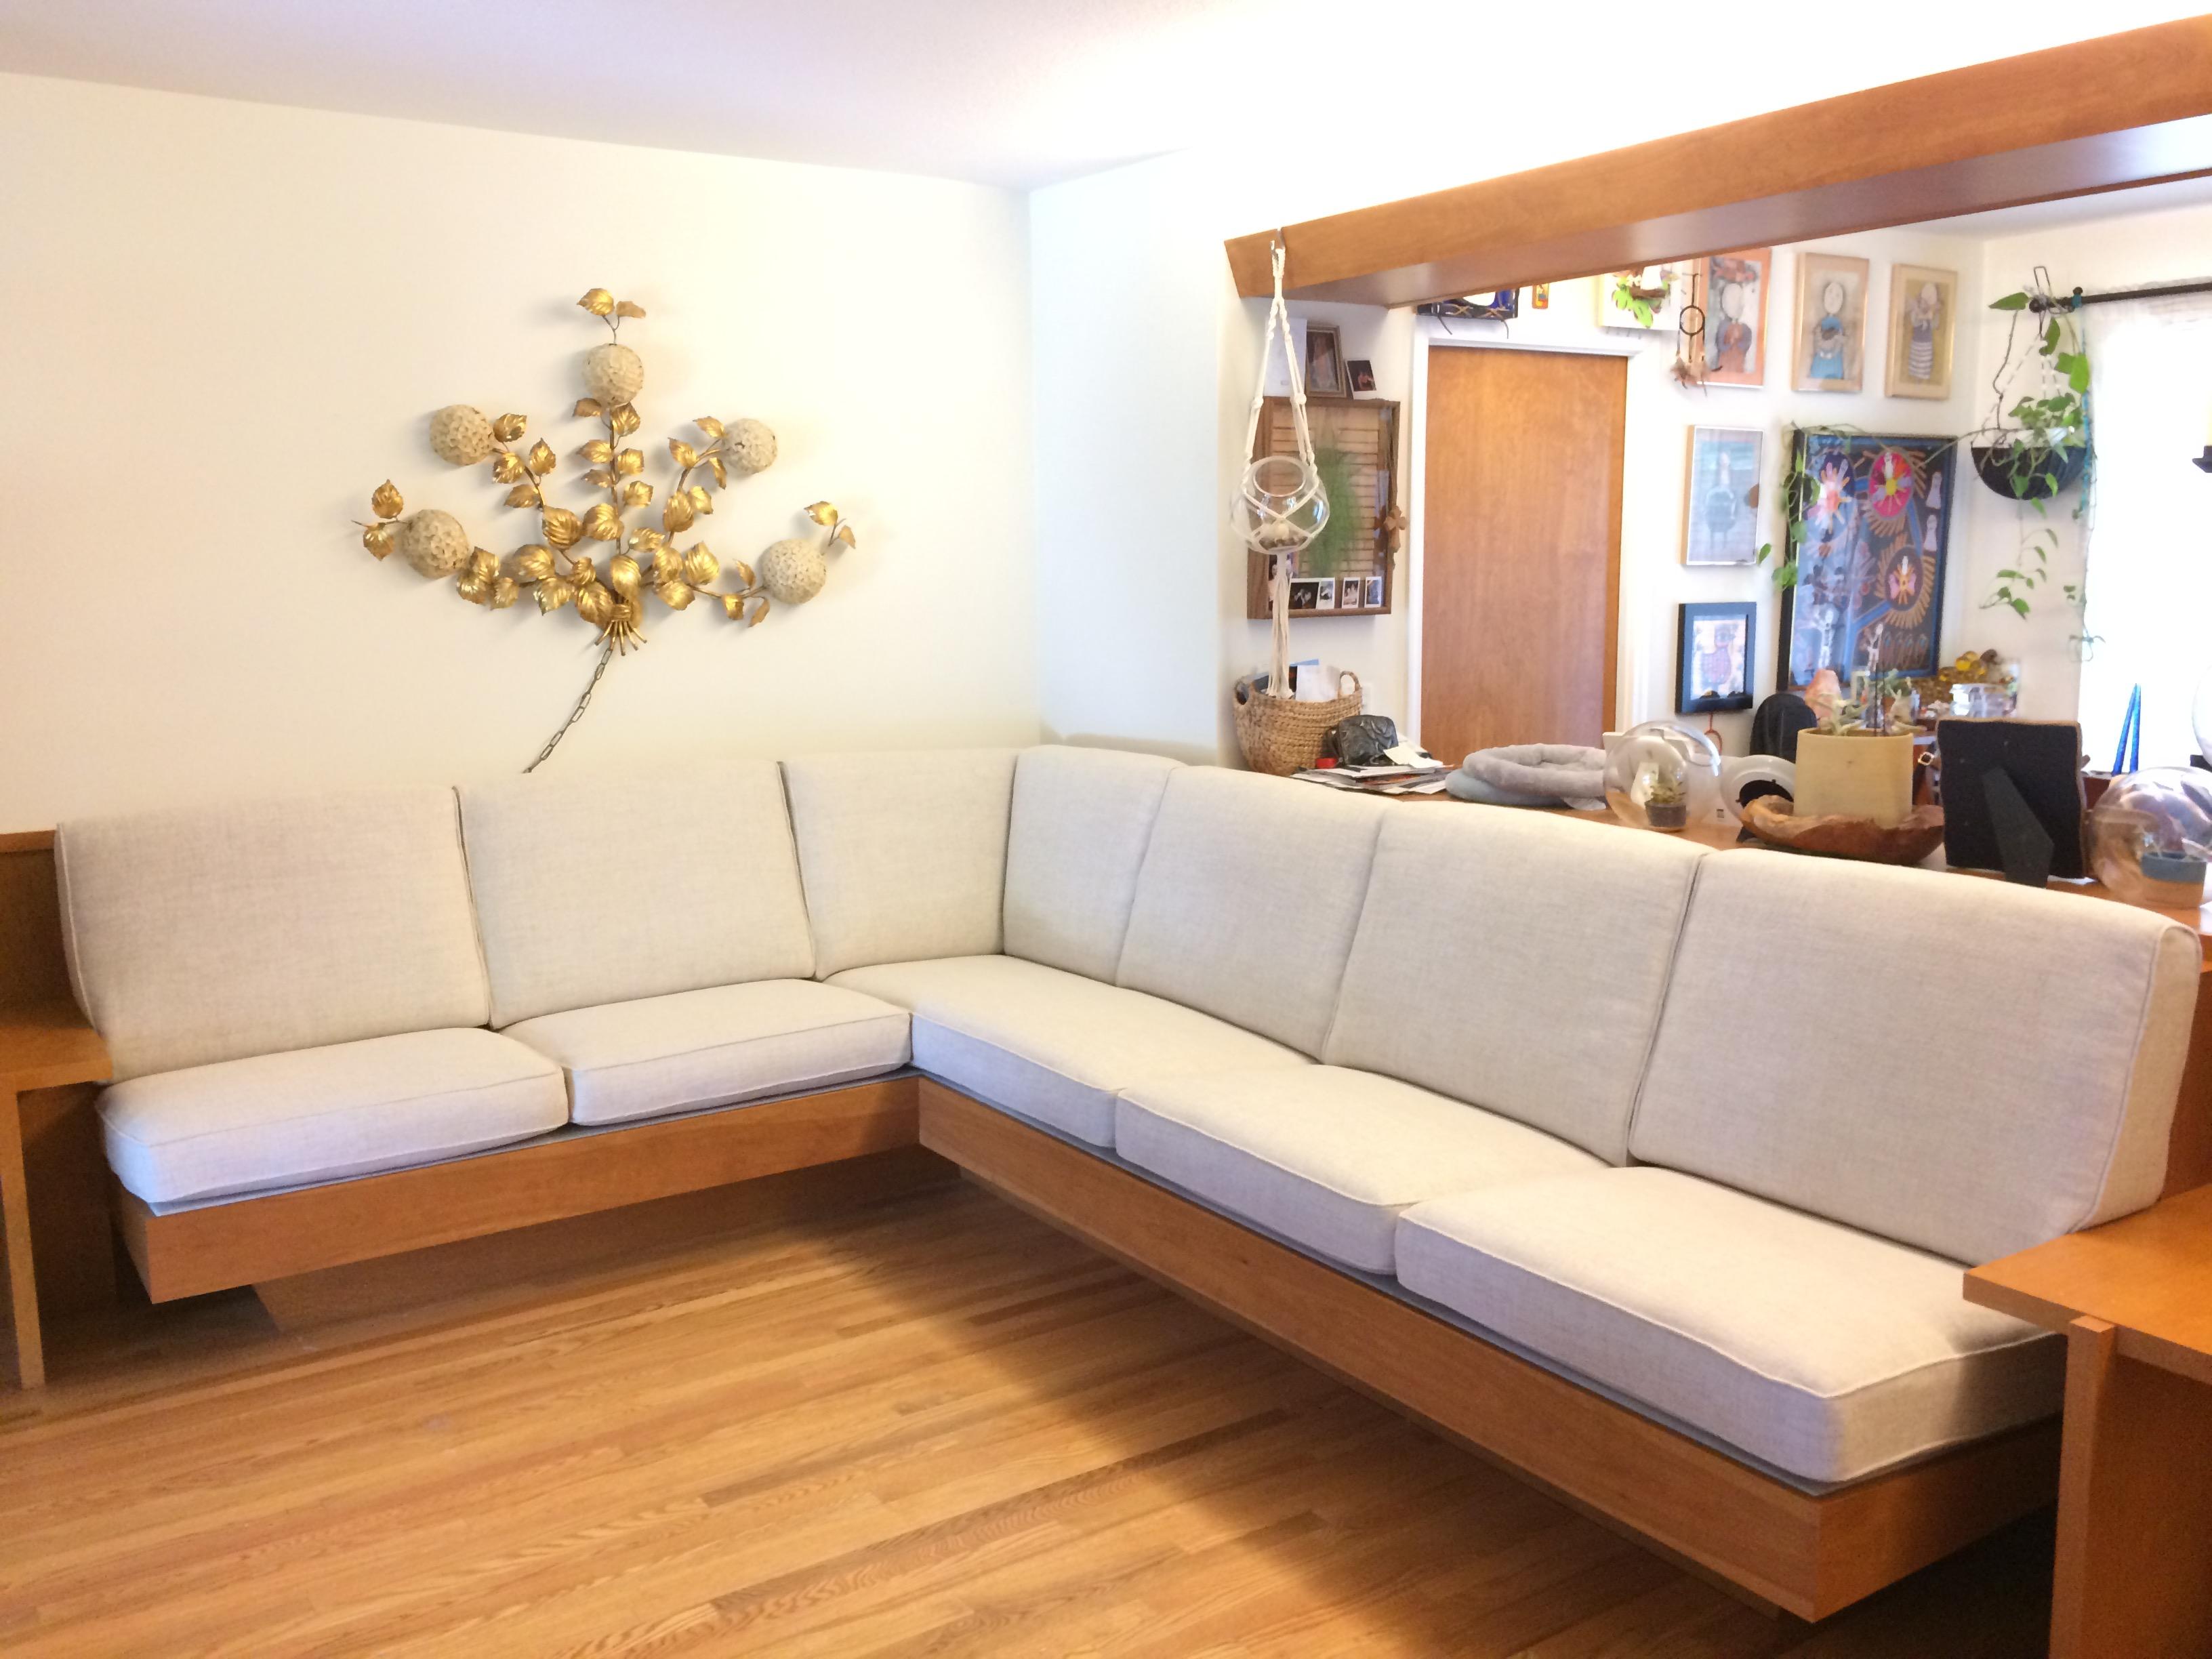 Built In Sectional Sofa, 10u2032 X 8u2032